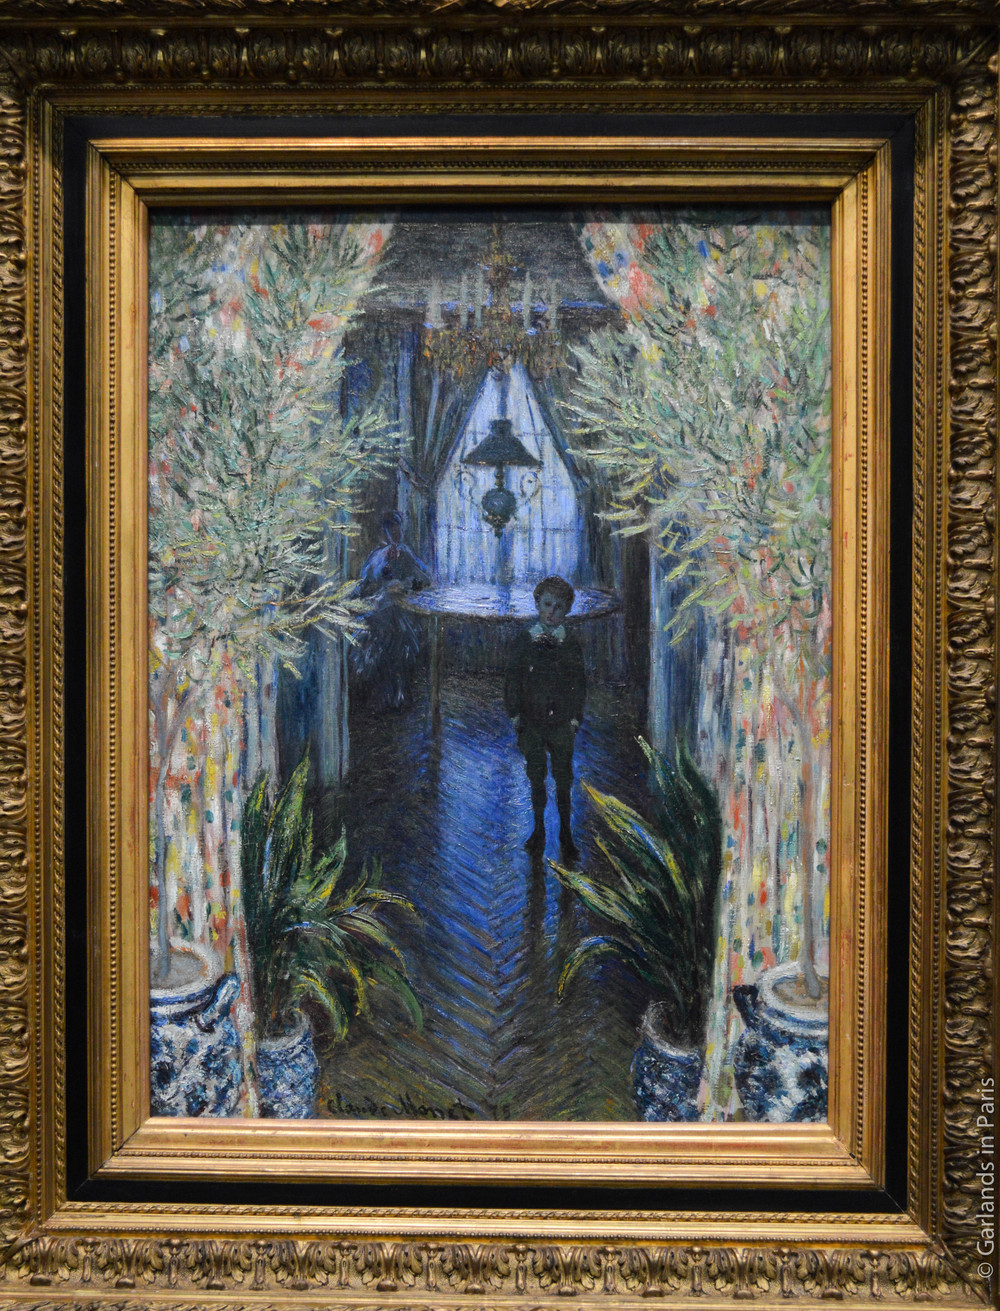 Hallway, painting, Orsay, Paris